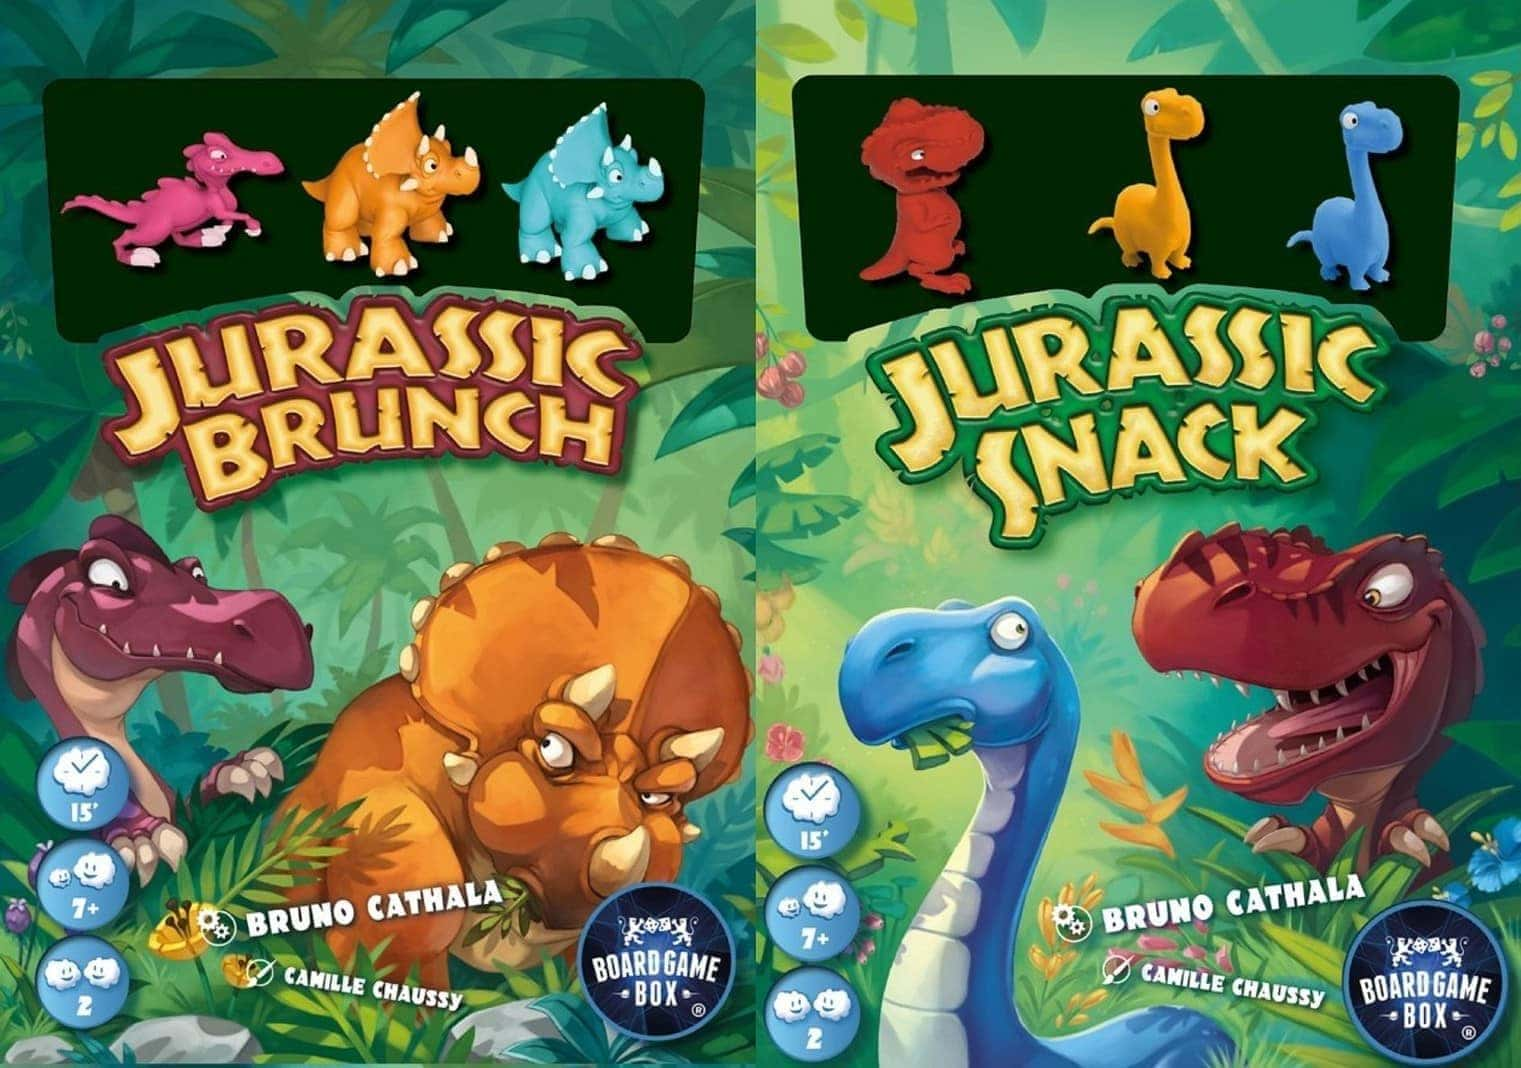 Jurassic Brunch / Jurassic Snack